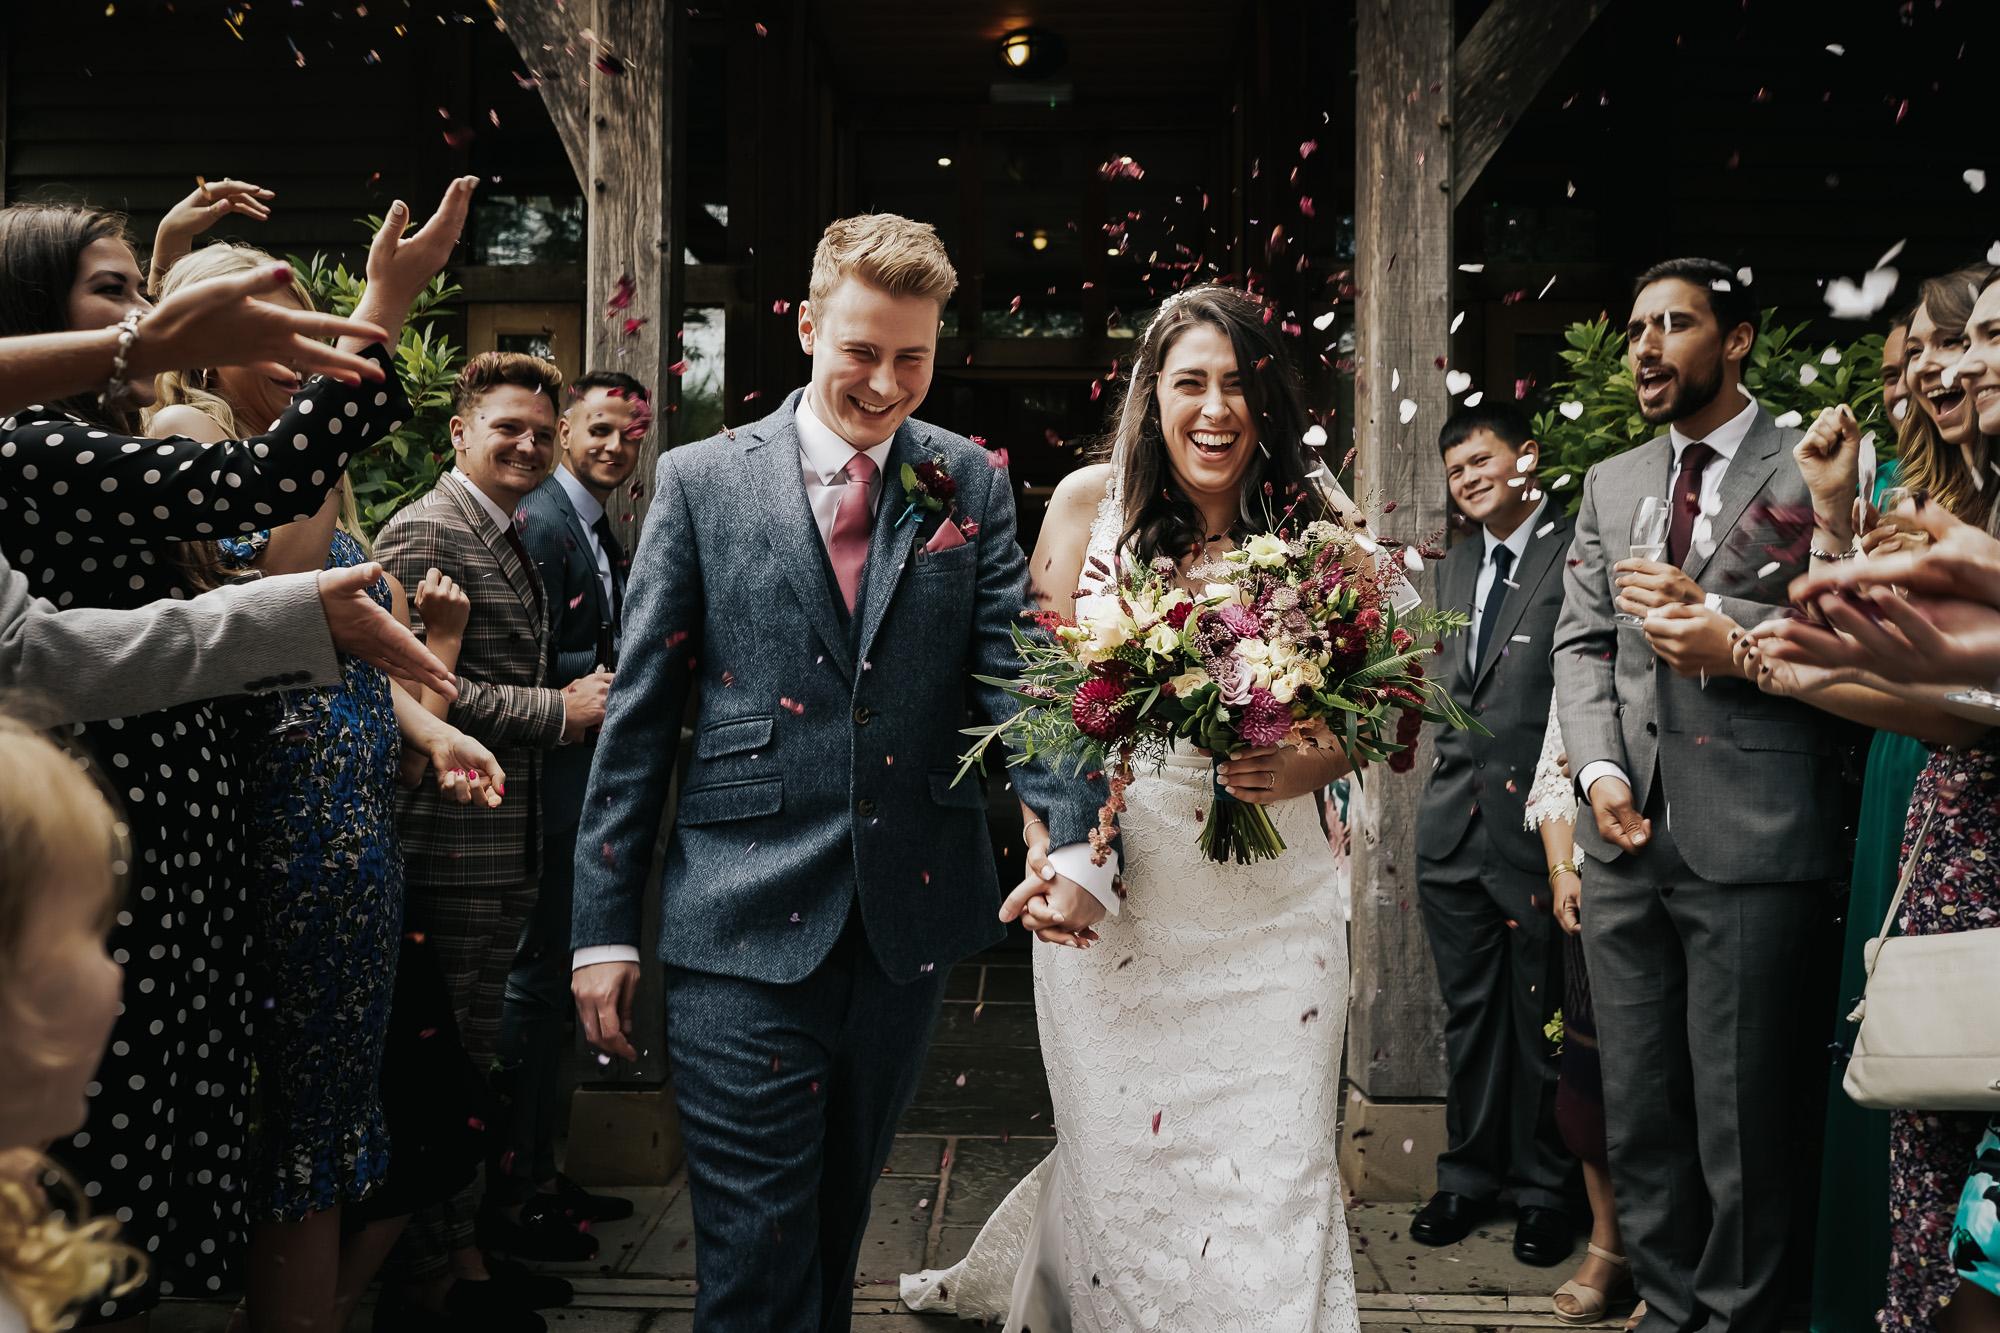 Oak tree of peover wedding photography cheshire wedding photographer (24 of 56).jpg